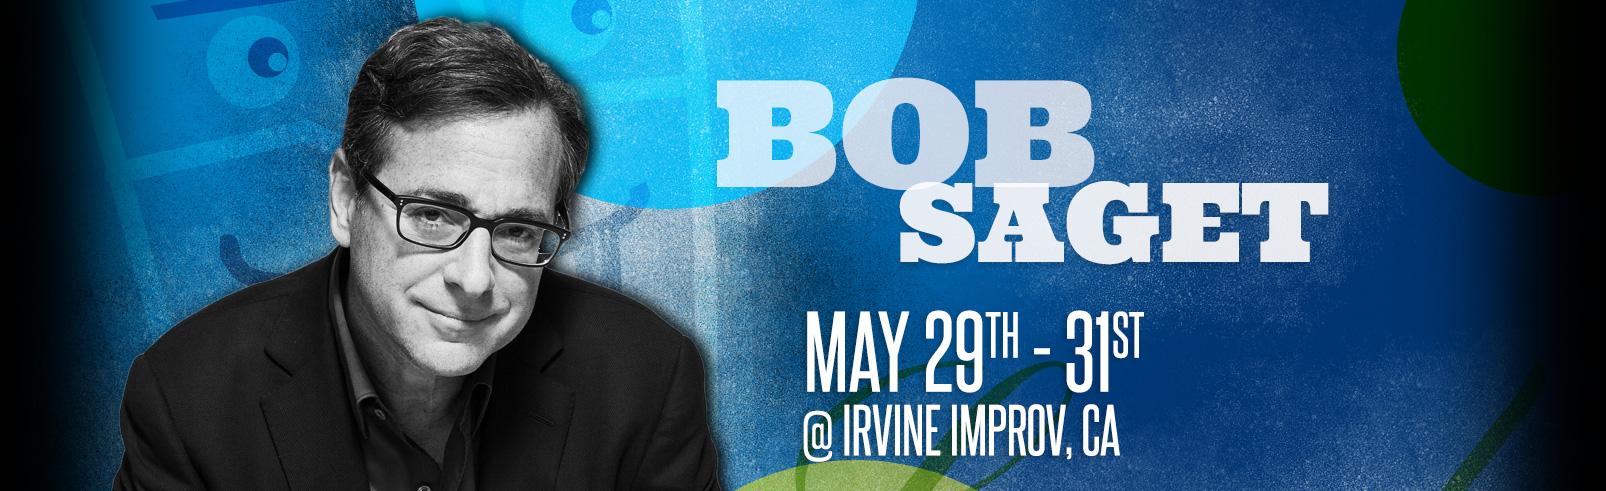 Bob Saget @ Irvine Improv